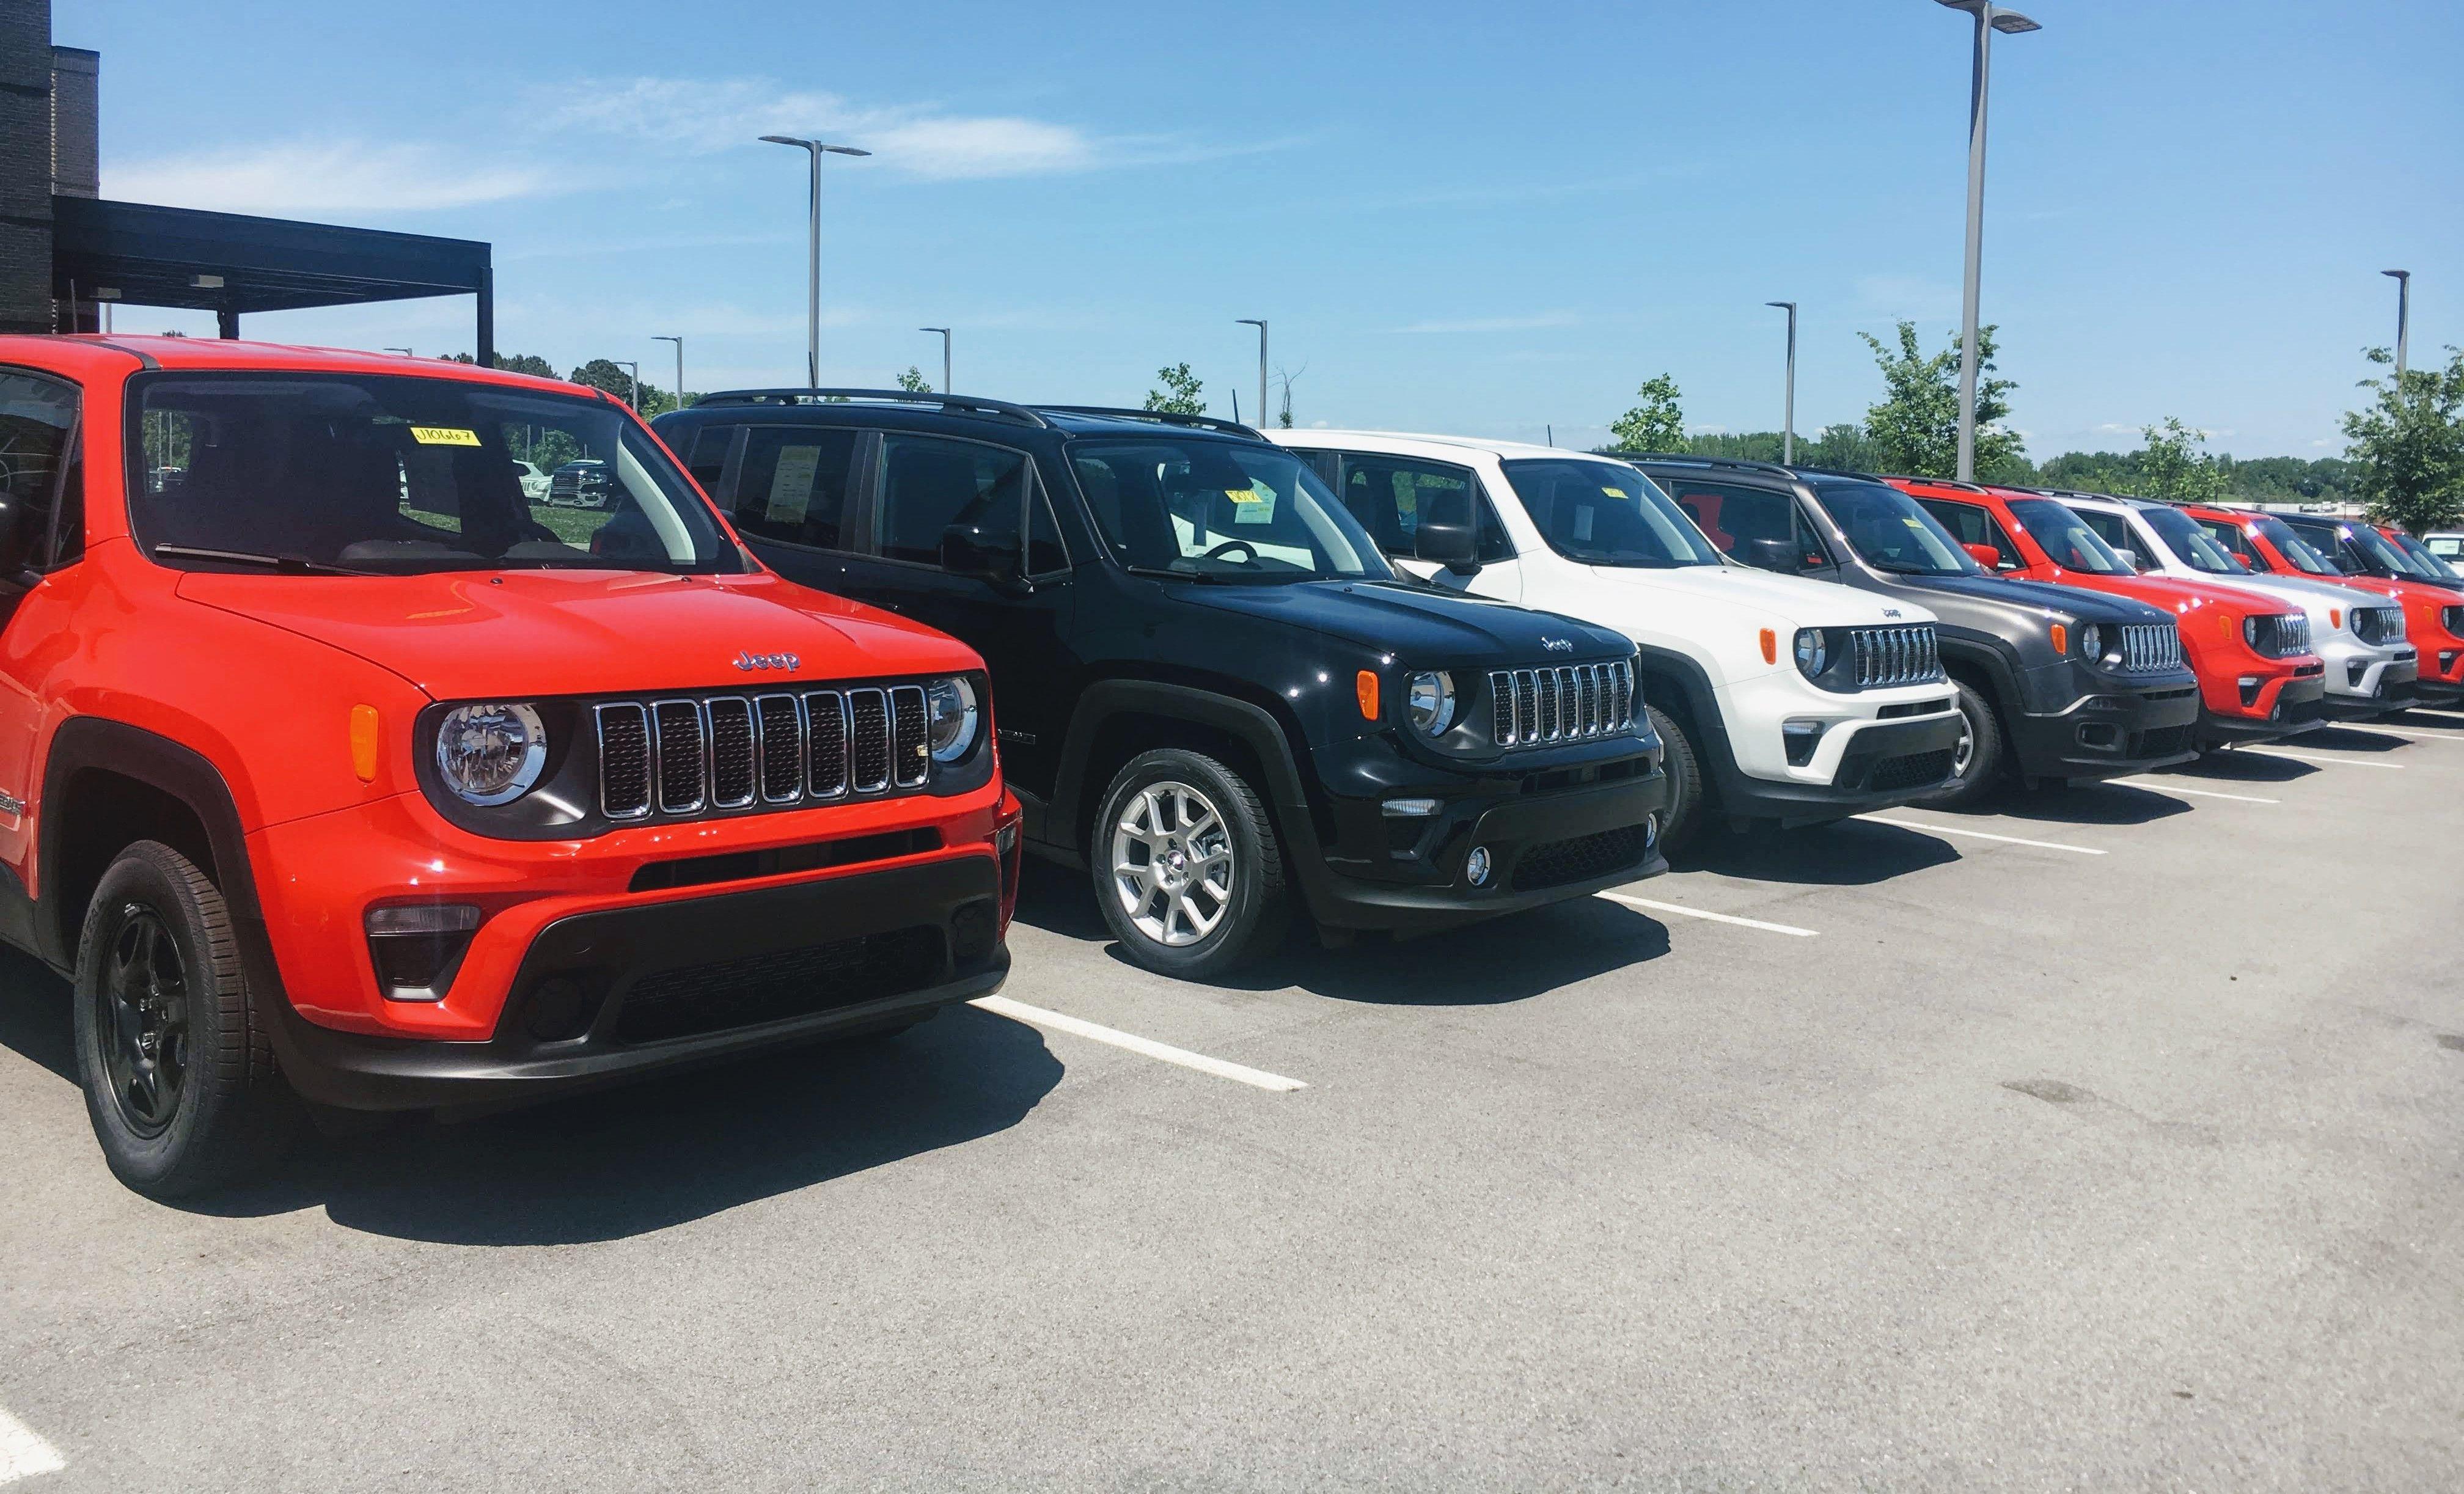 2019 jeep renegades jeep renegade jeep chrysler jeep pinterest